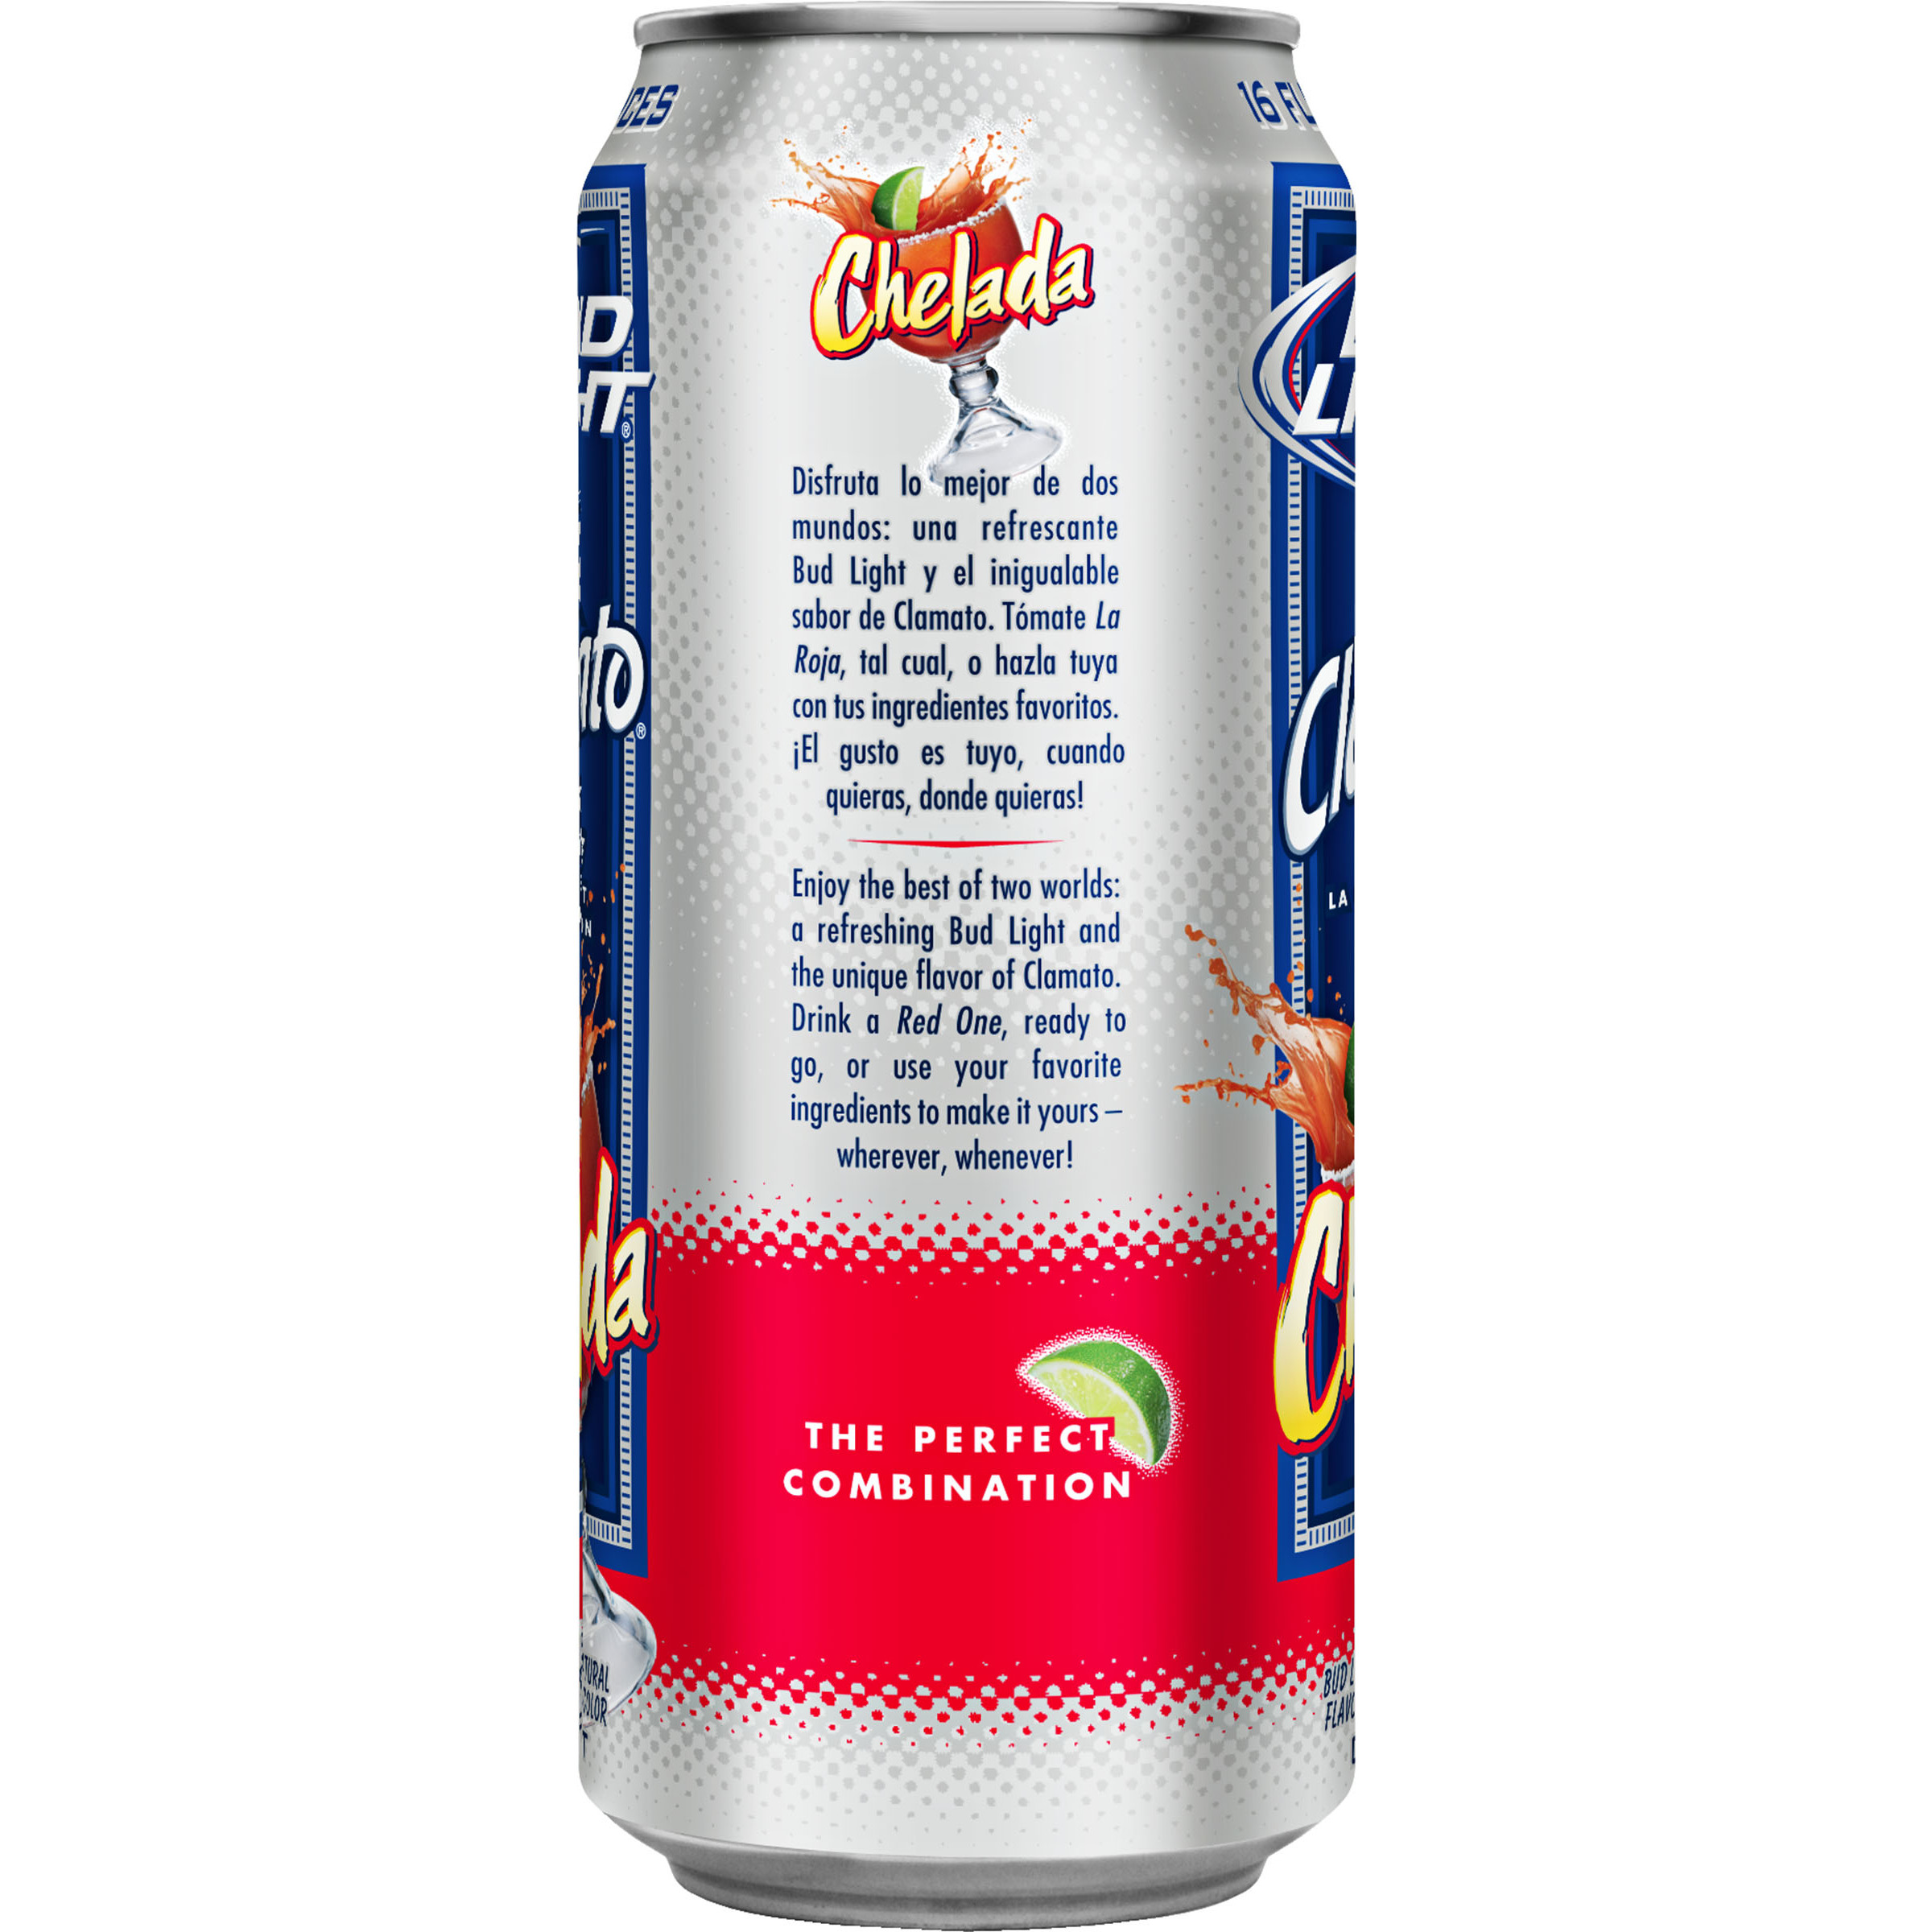 Chelada Bud Light Beer, 4 Pk 16 Fl. Oz. Cans   Walmart.com